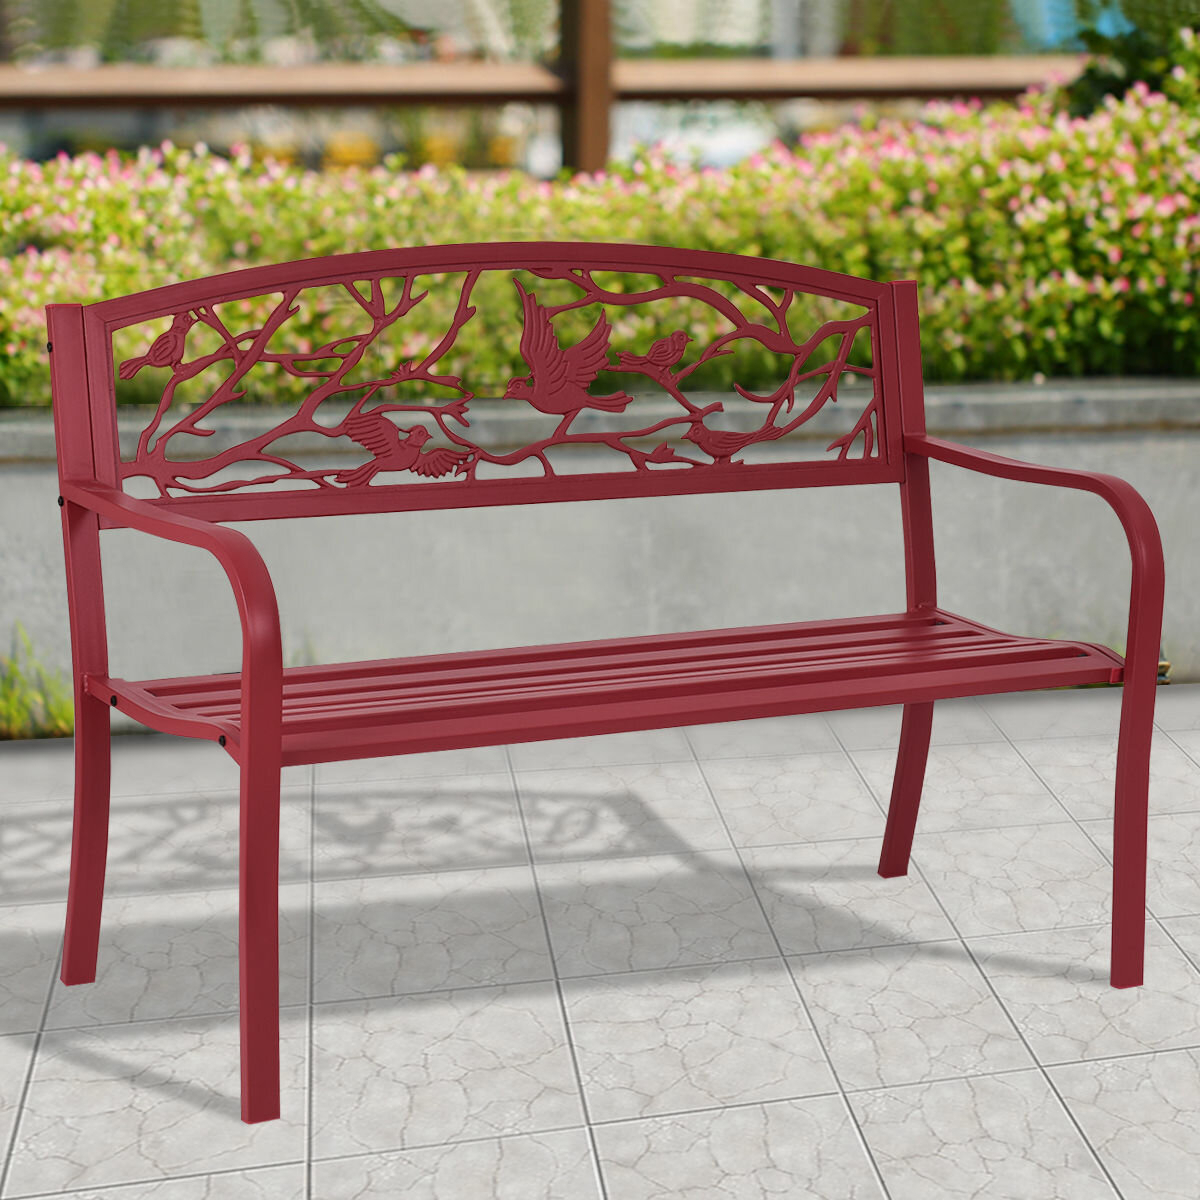 Parklawn Patio Steel Garden Bench Regarding Ishan Steel Park Benches (View 10 of 25)